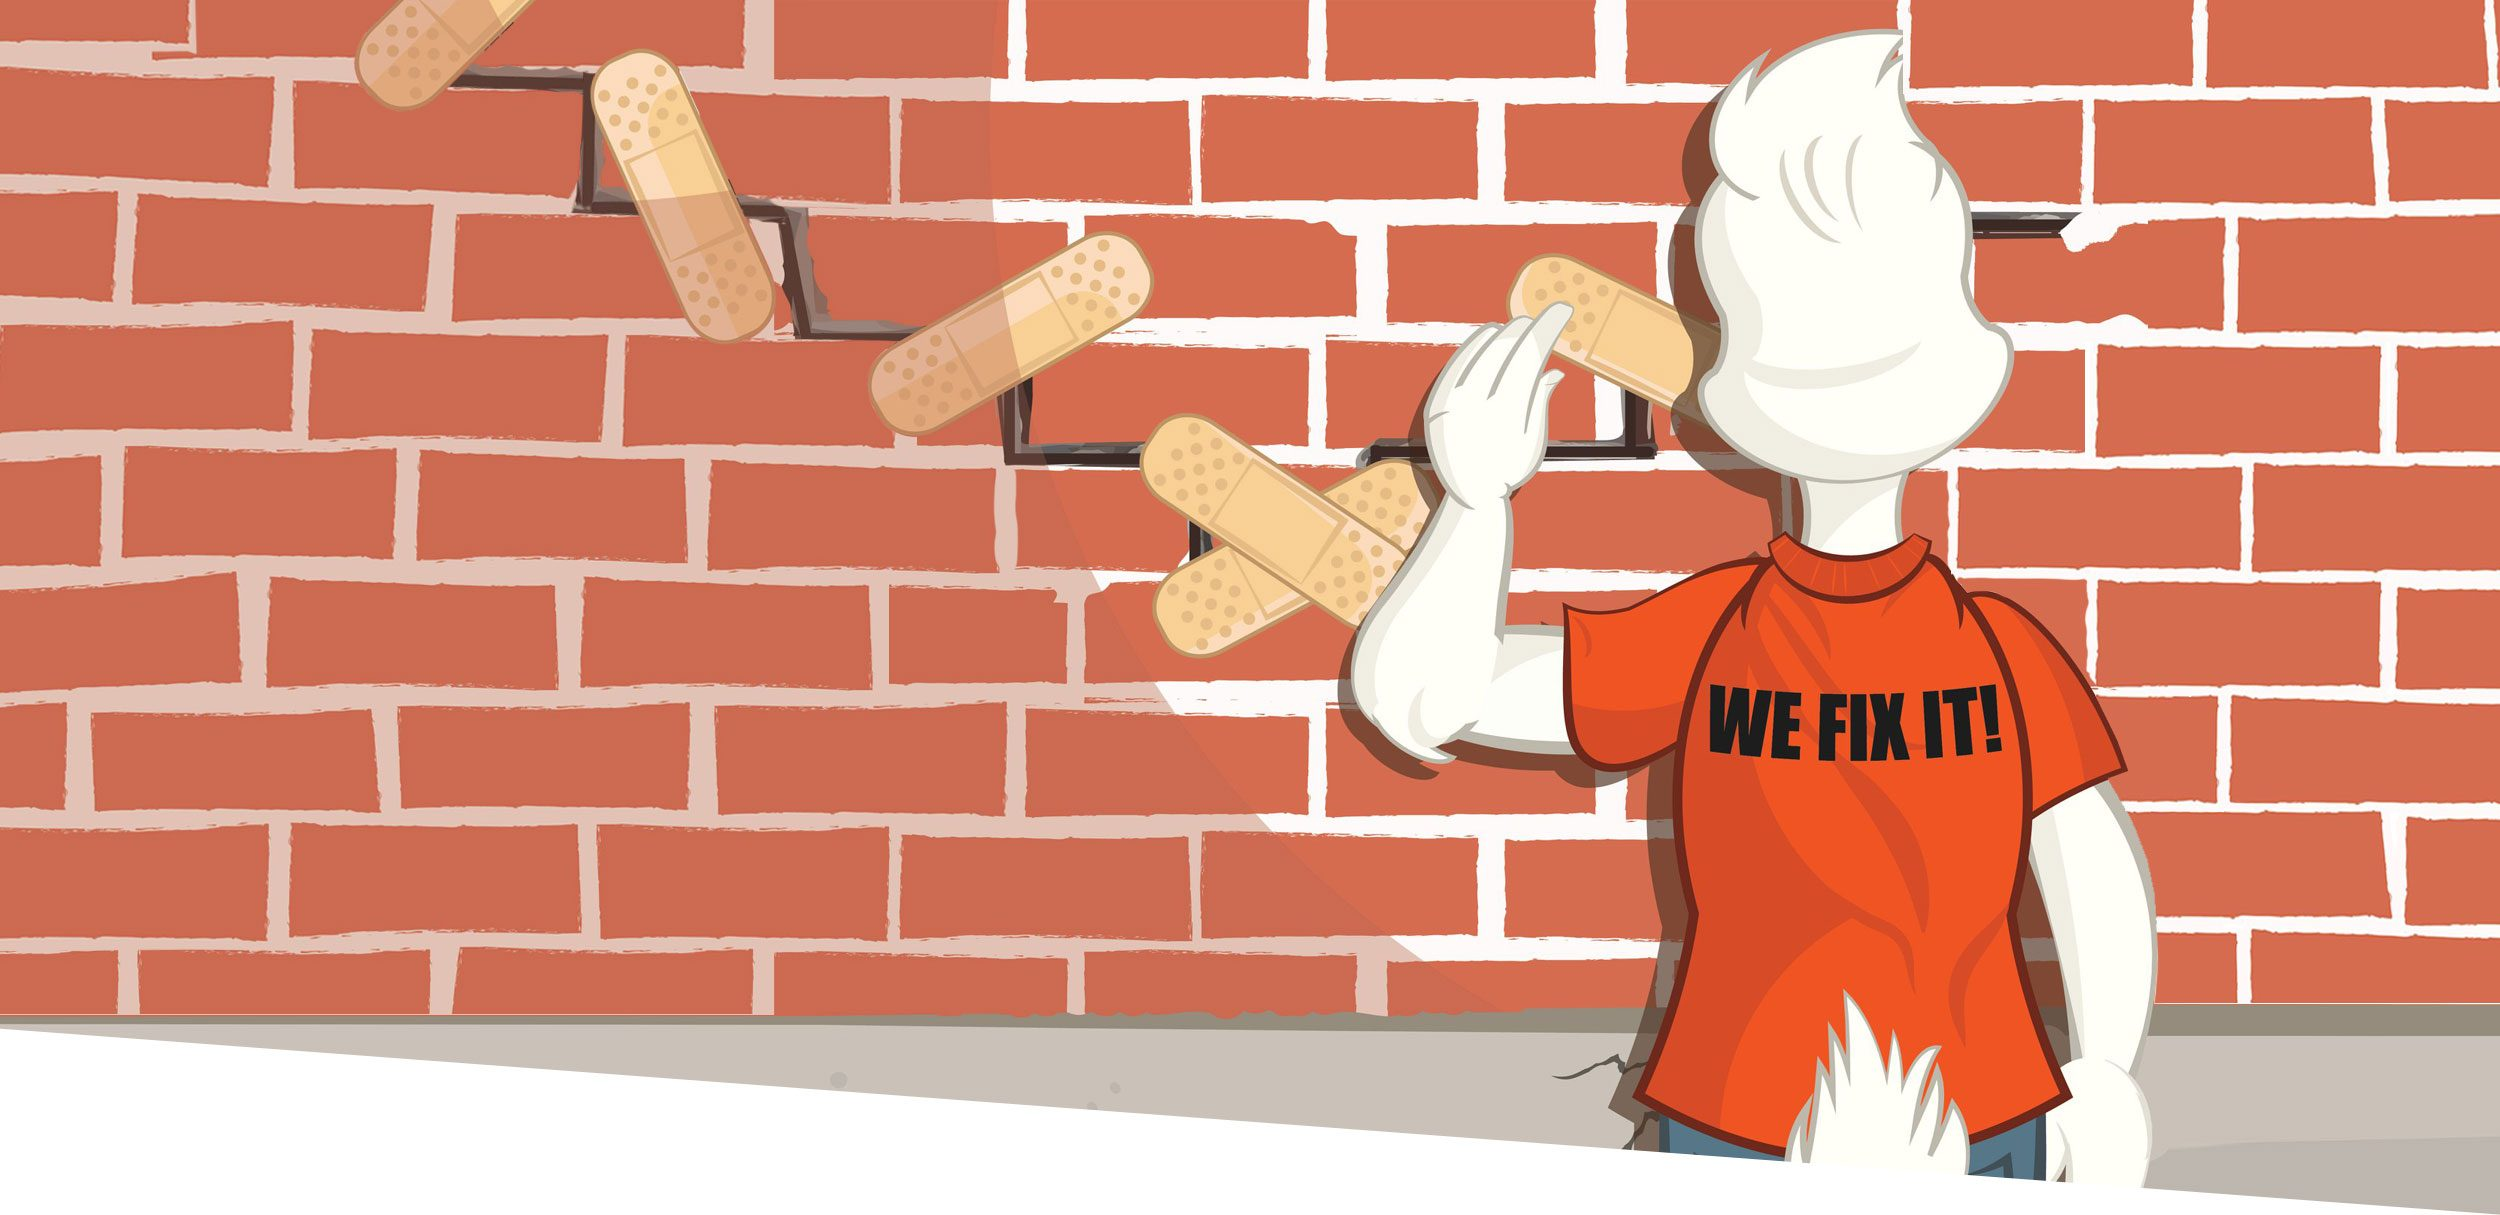 foundation settlement causes cracks